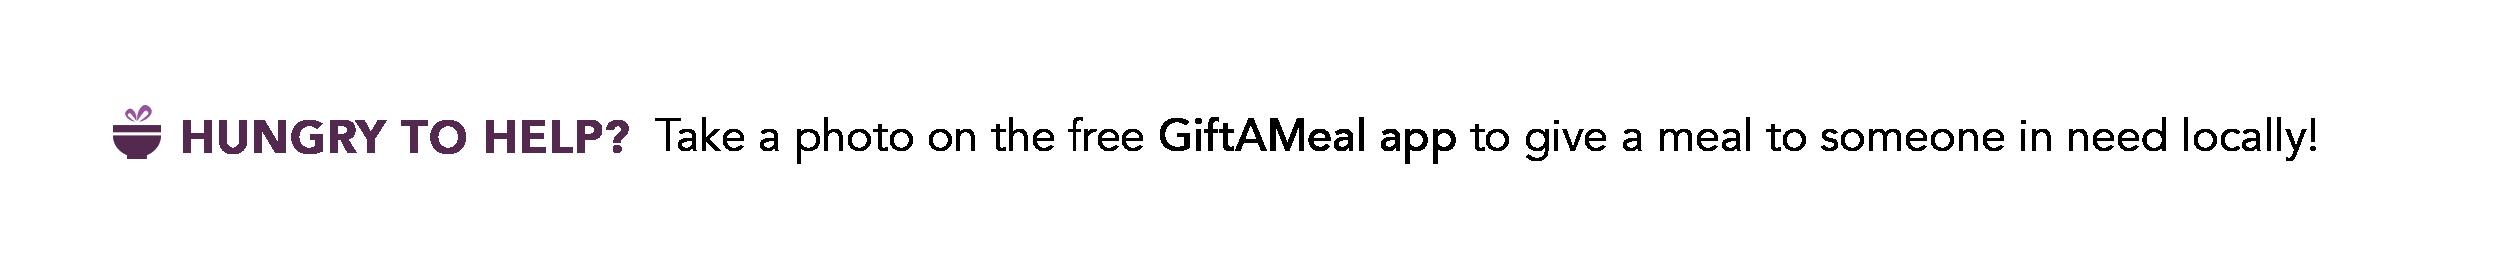 menu graphics_6.png